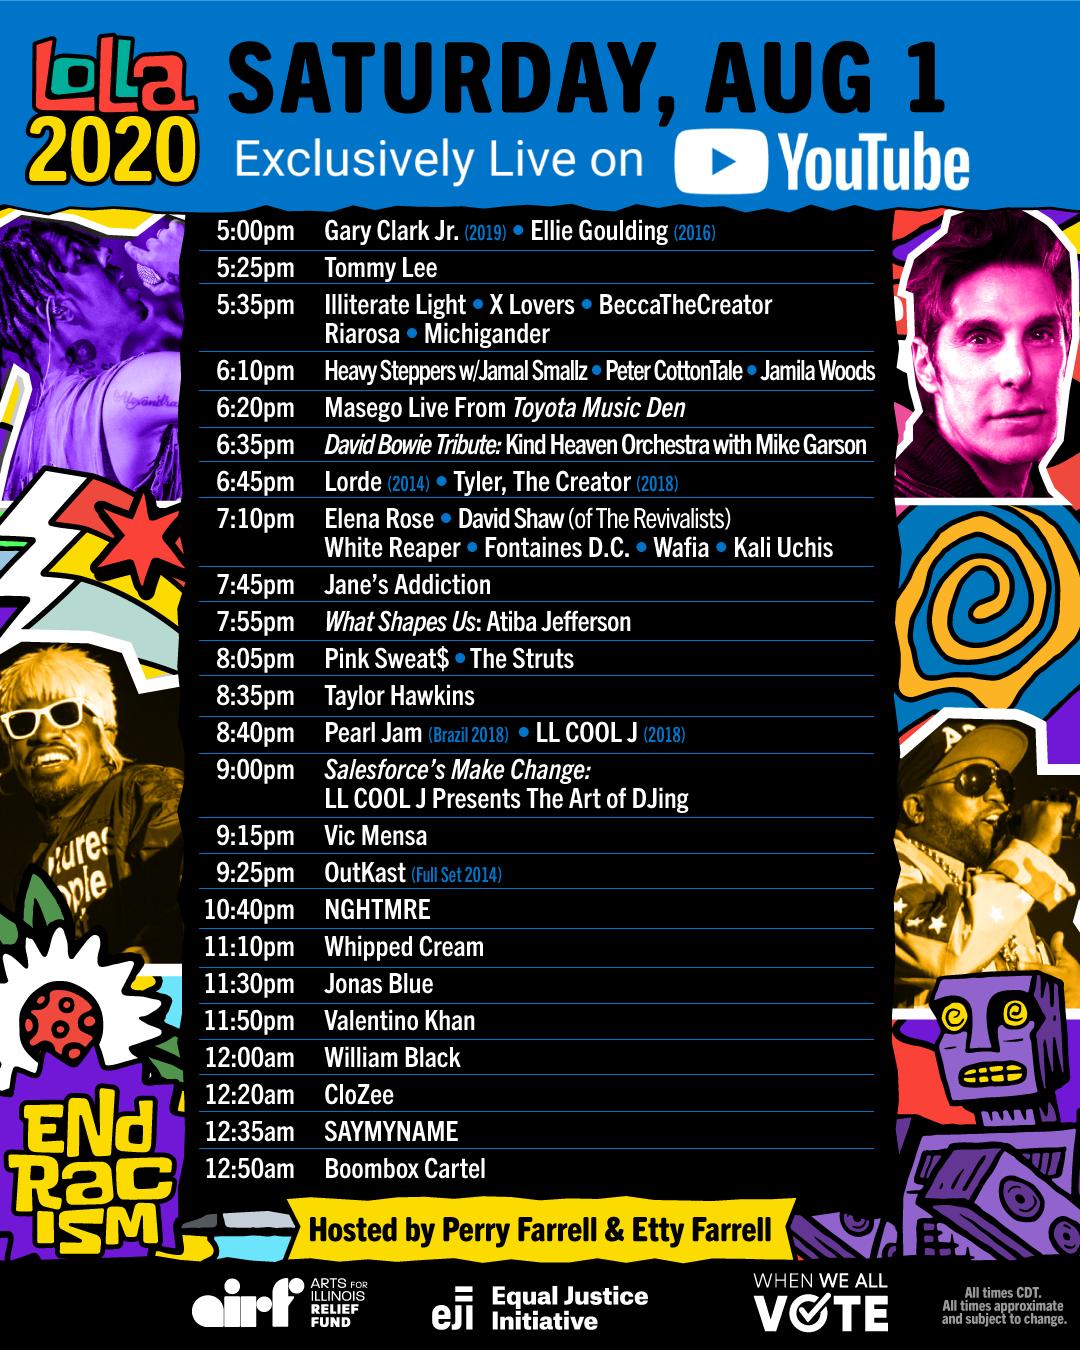 Lollapalooza 2020 Saturday